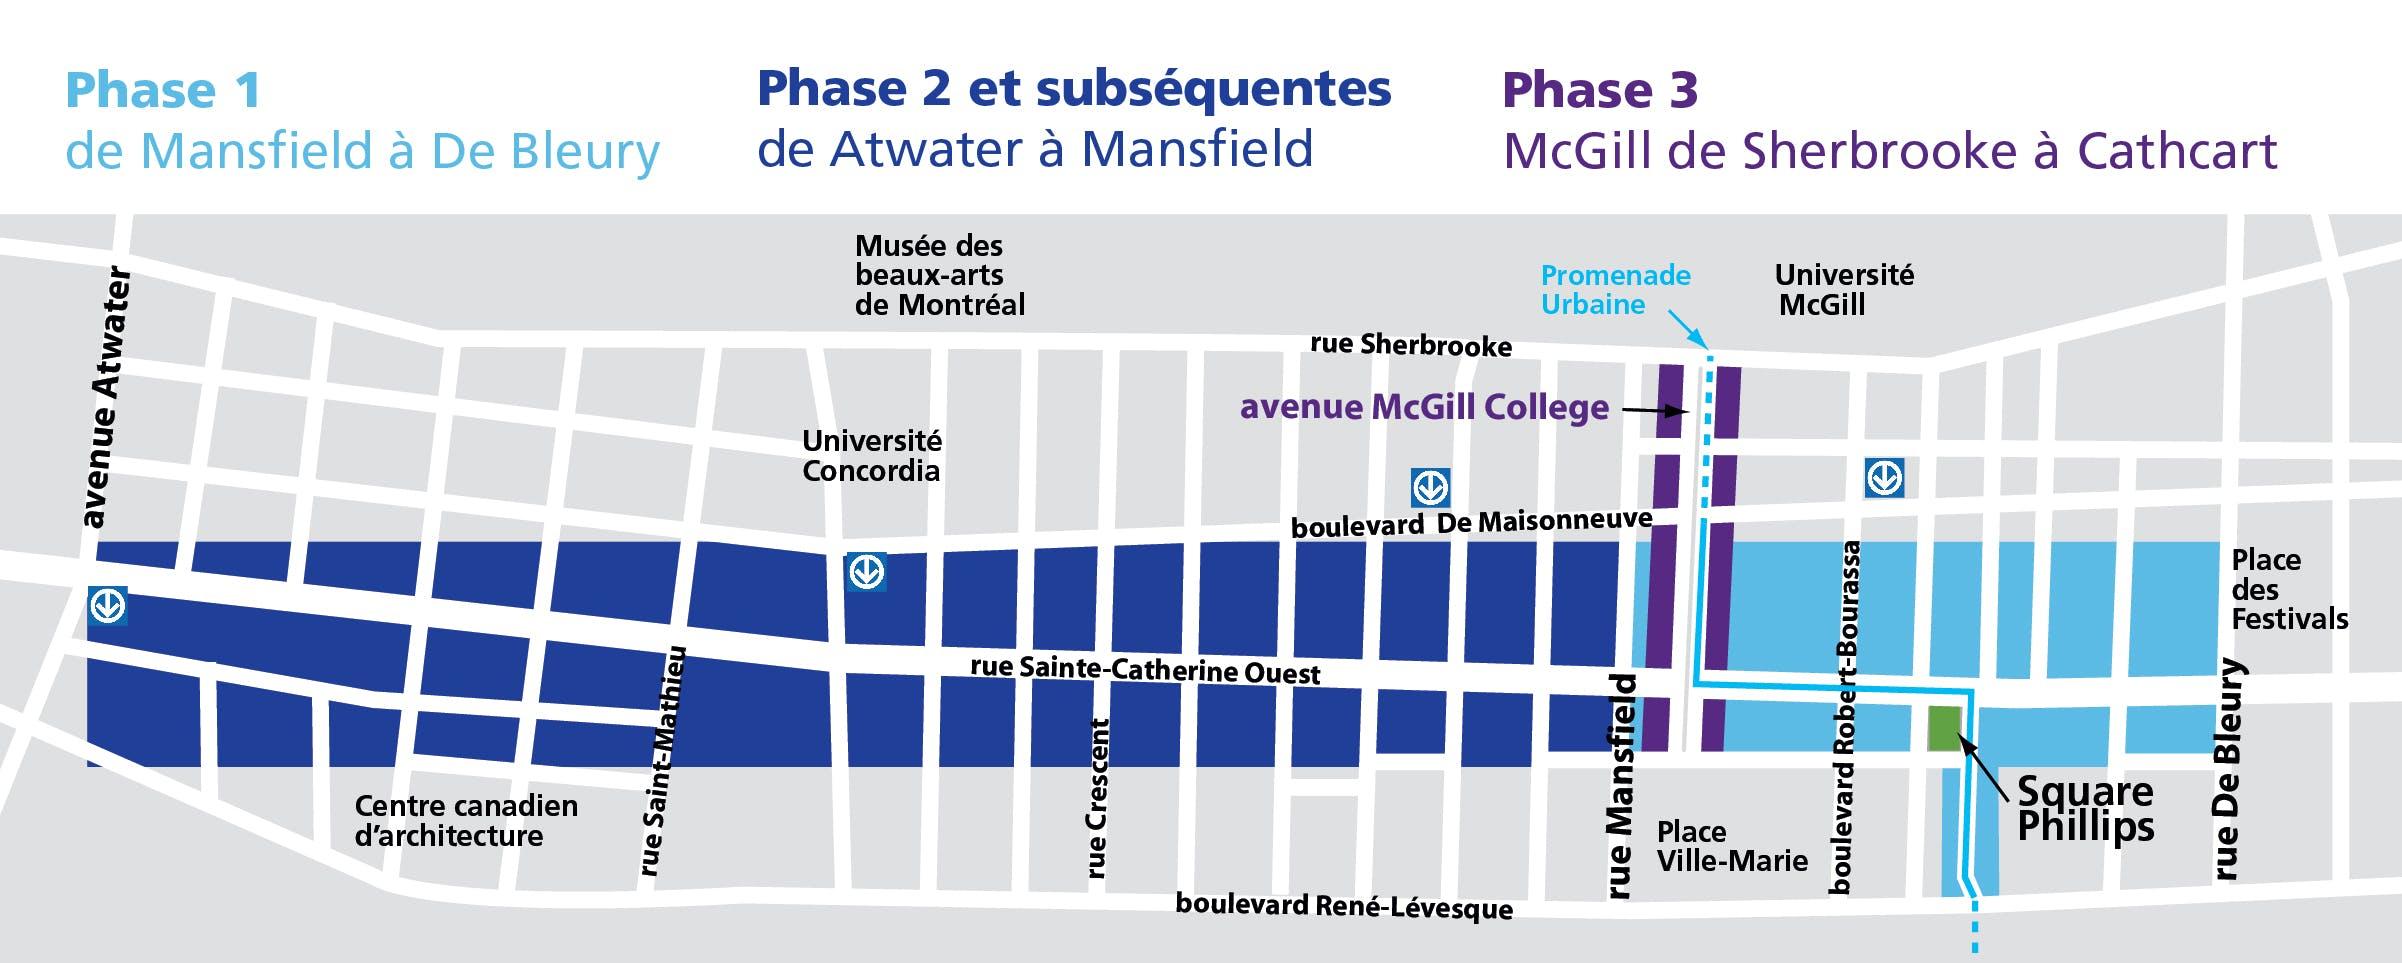 Phases du projet Sainte-Catherine Ouest